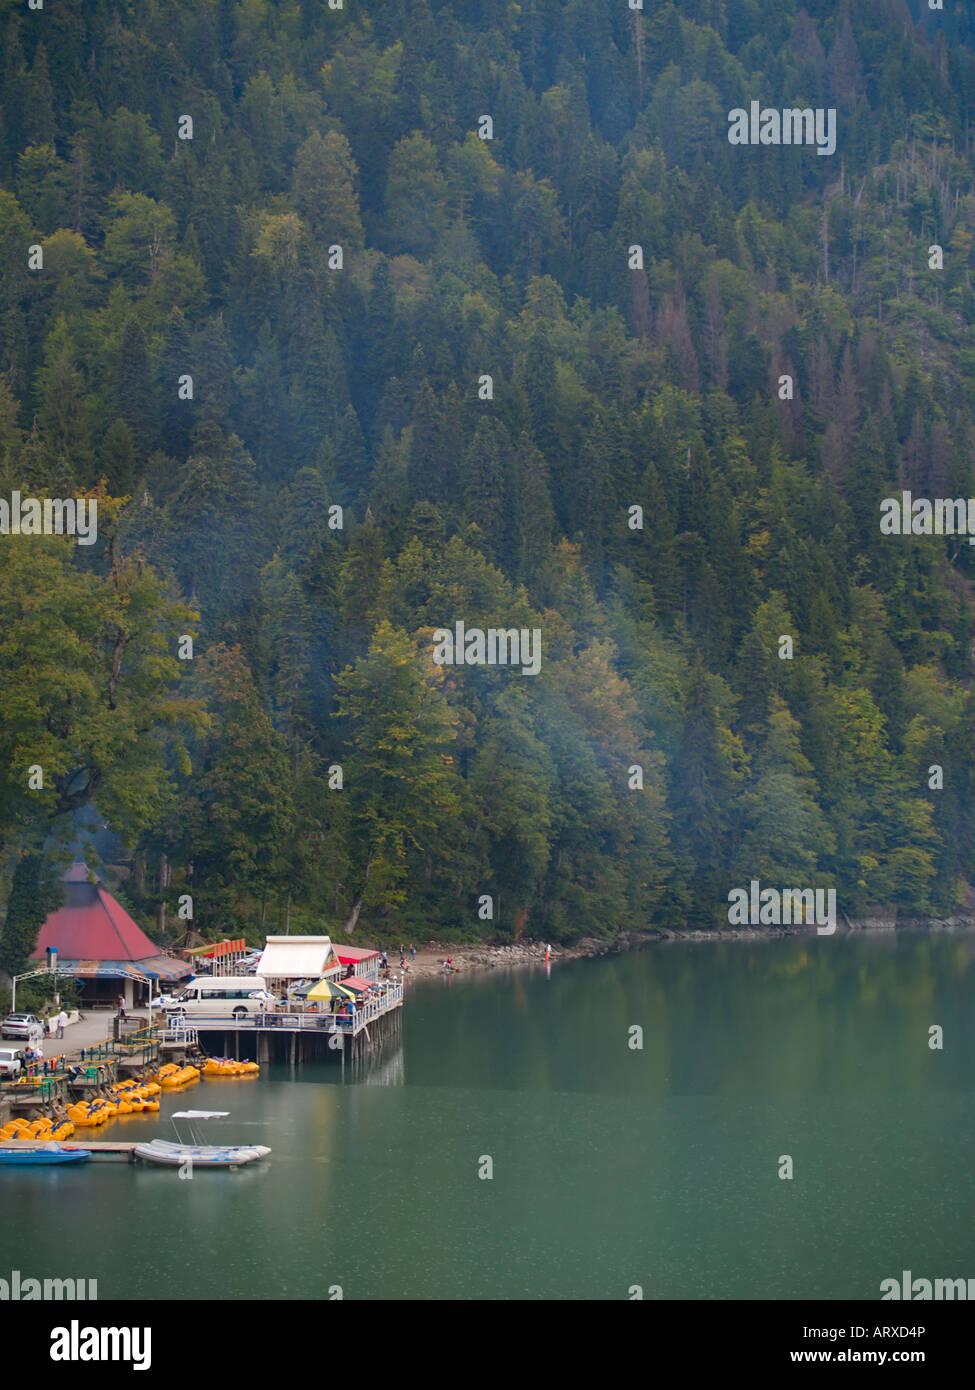 Populous embankment on a Ritsa Lake in Caucasian Mountains in Abkhazia - Stock Image